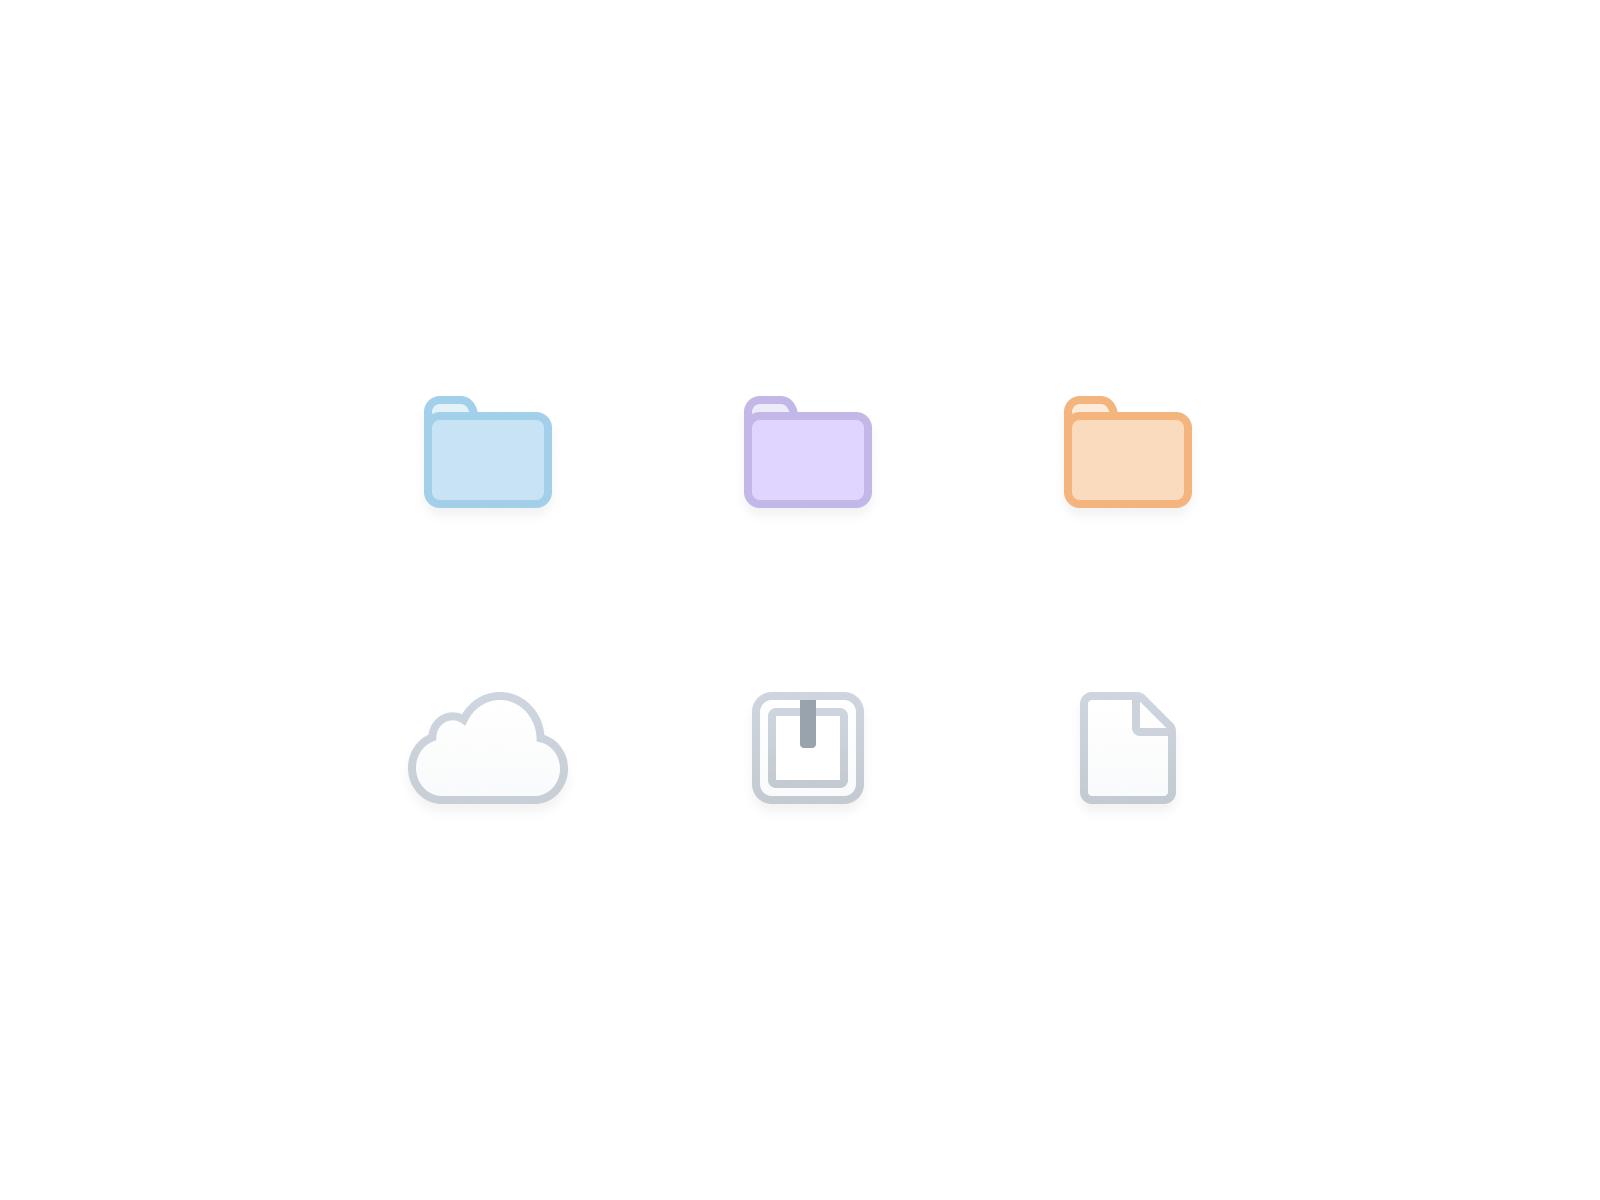 ☁️📄📁 File Icons icon flat figma application icons web design ios app ux ui